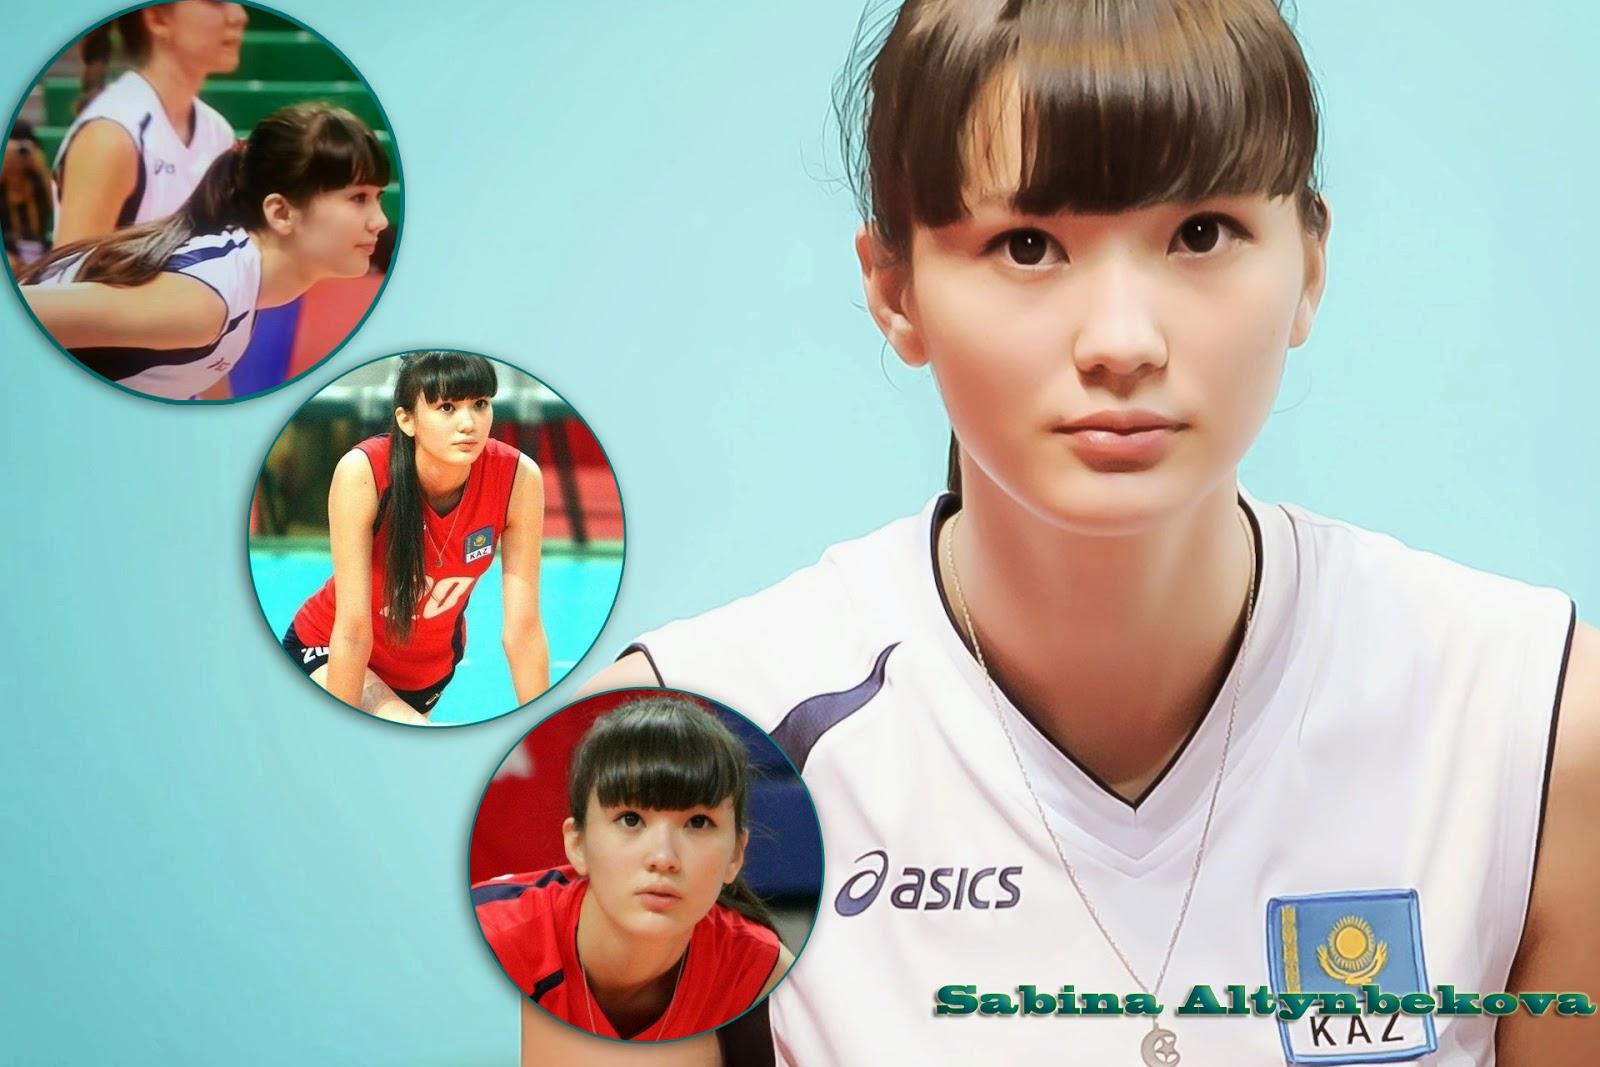 Sabina Altynbekova Pemain Voly Cantik Kazakhstan